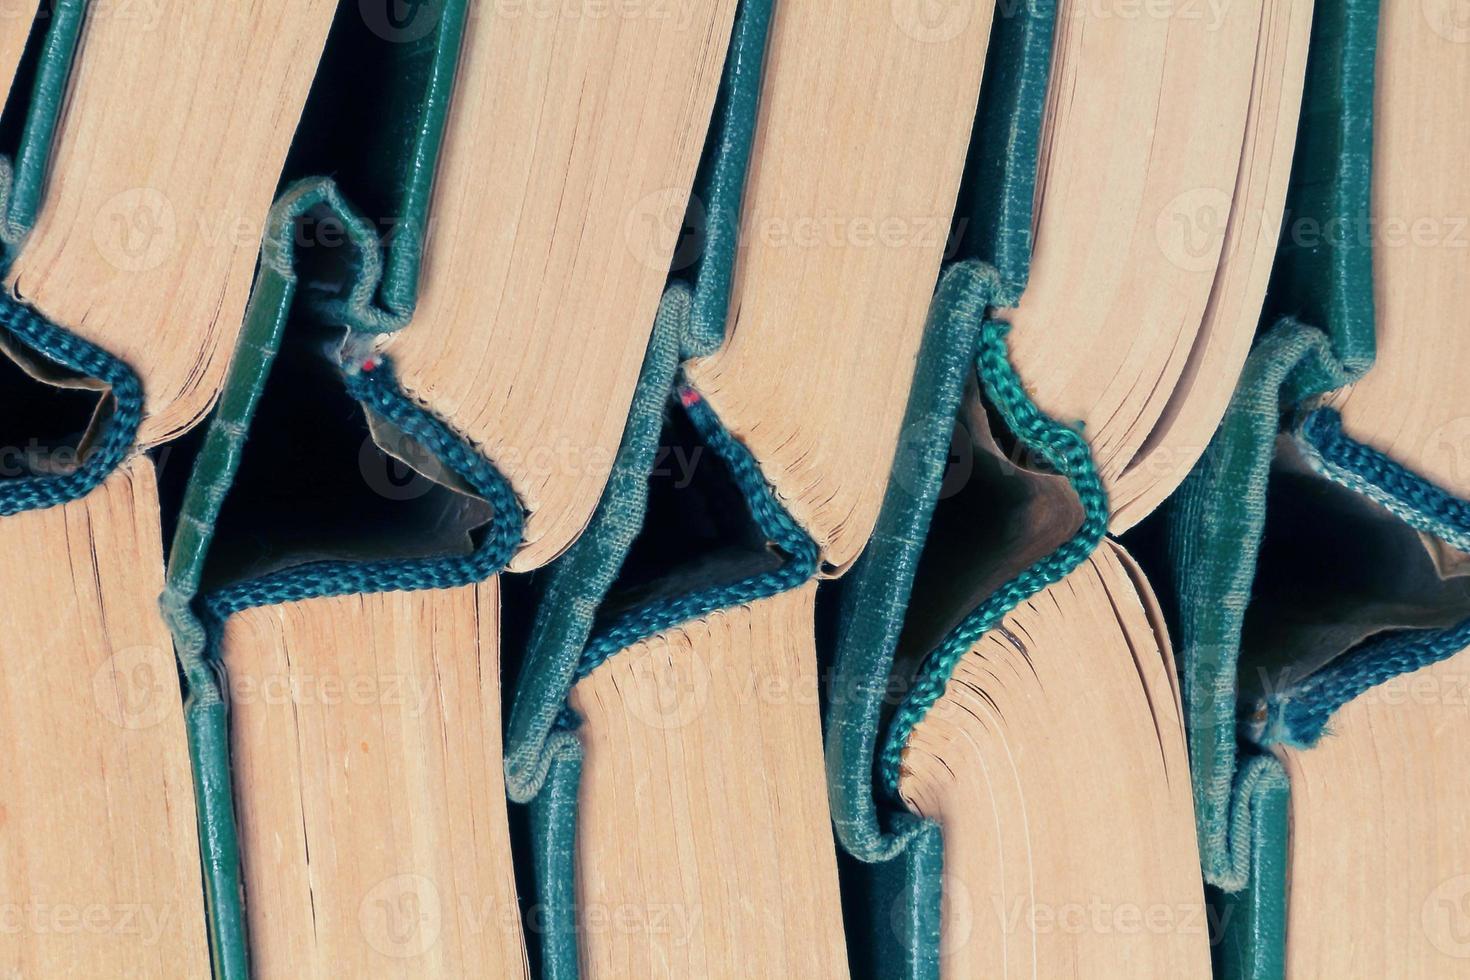 impilare vecchi libri a copertina rigida foto